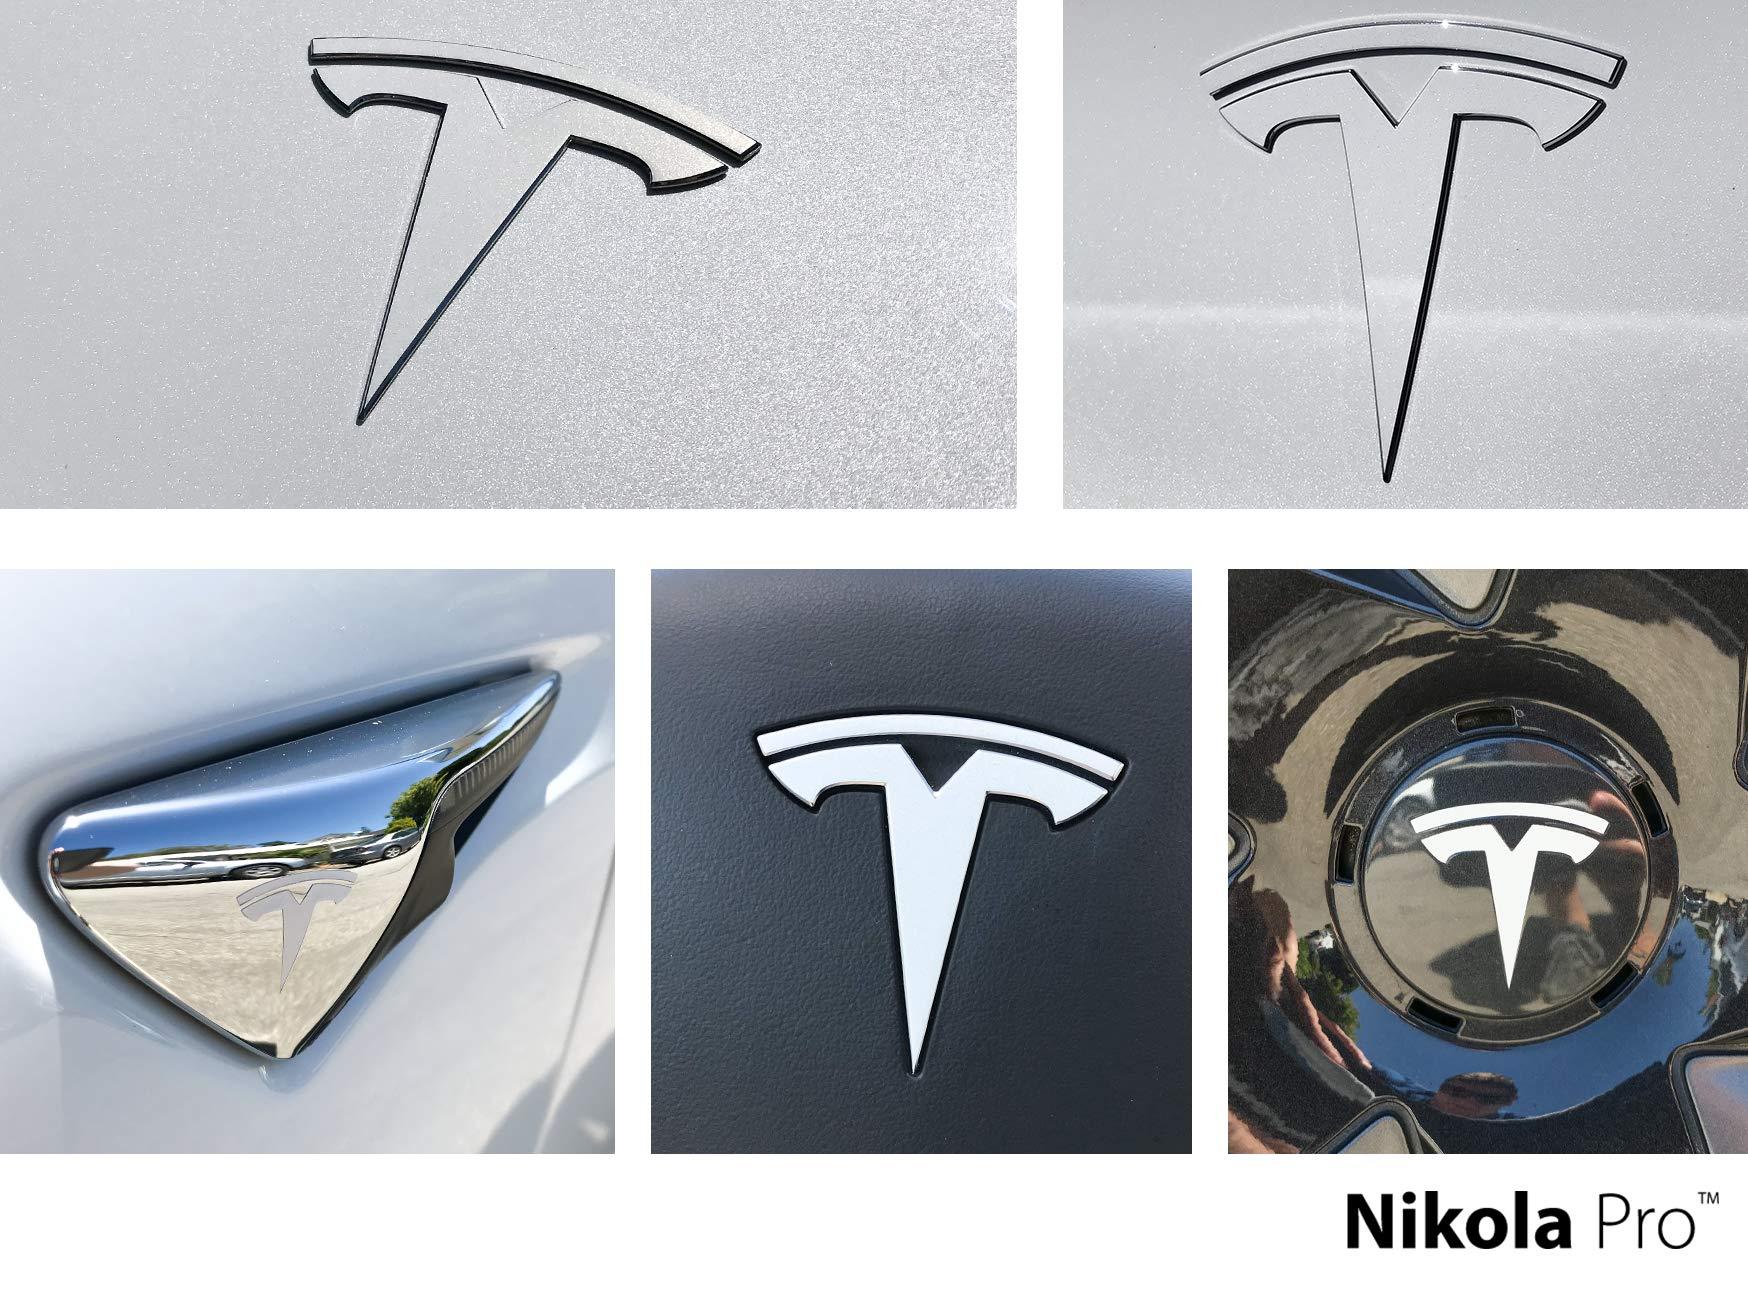 White Nikola Pro Tesla Model 3 Door Exit Decal Set